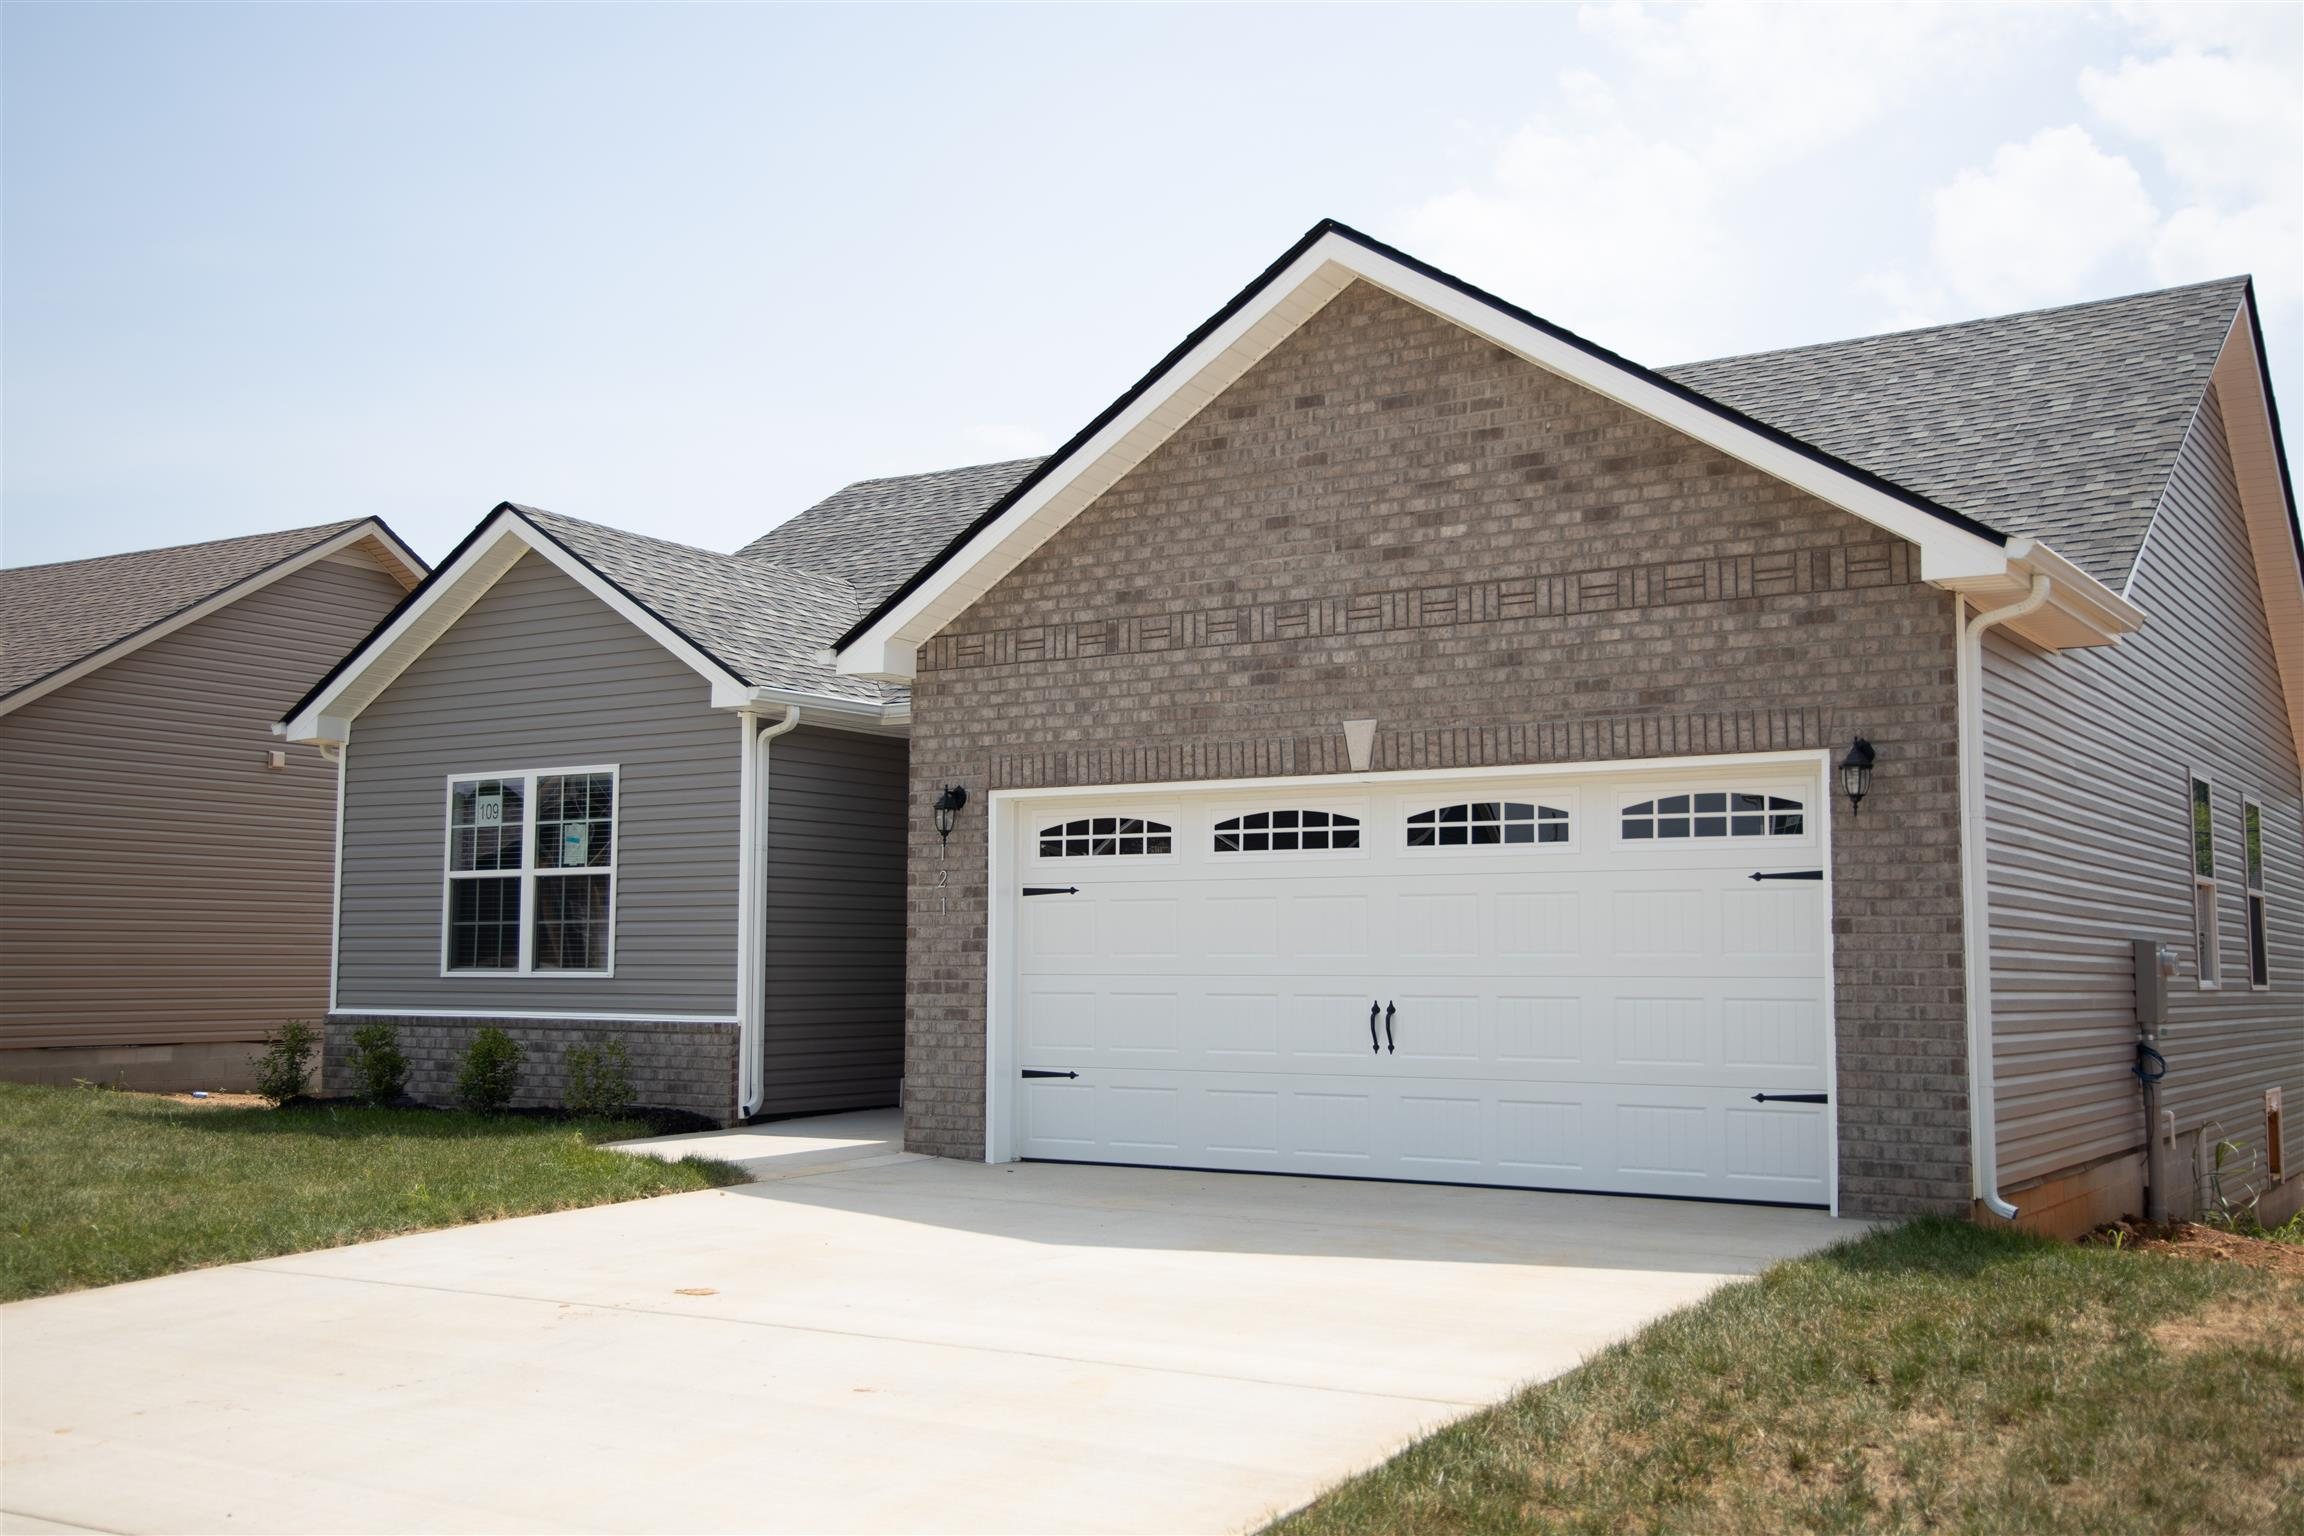 109 Rose Edd, Oak Grove, KY 42262 - Oak Grove, KY real estate listing